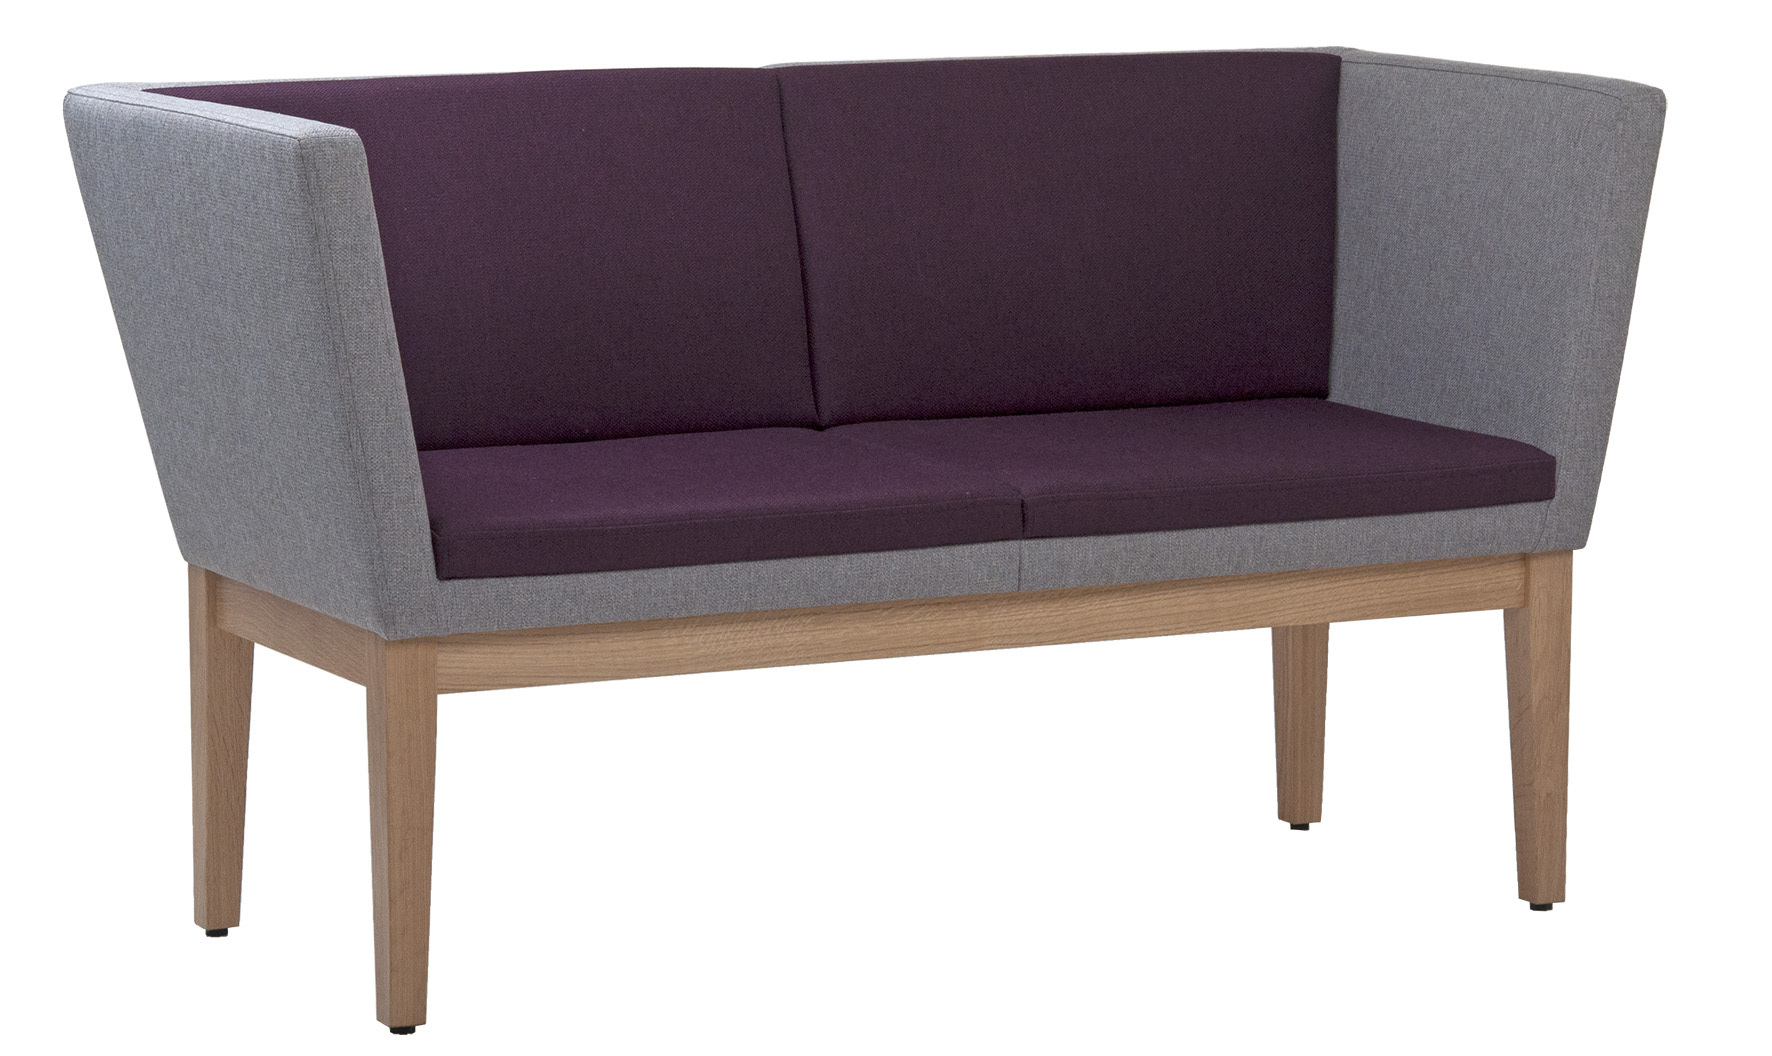 Neues in Sachen Stuhl, Hocker & Sofa